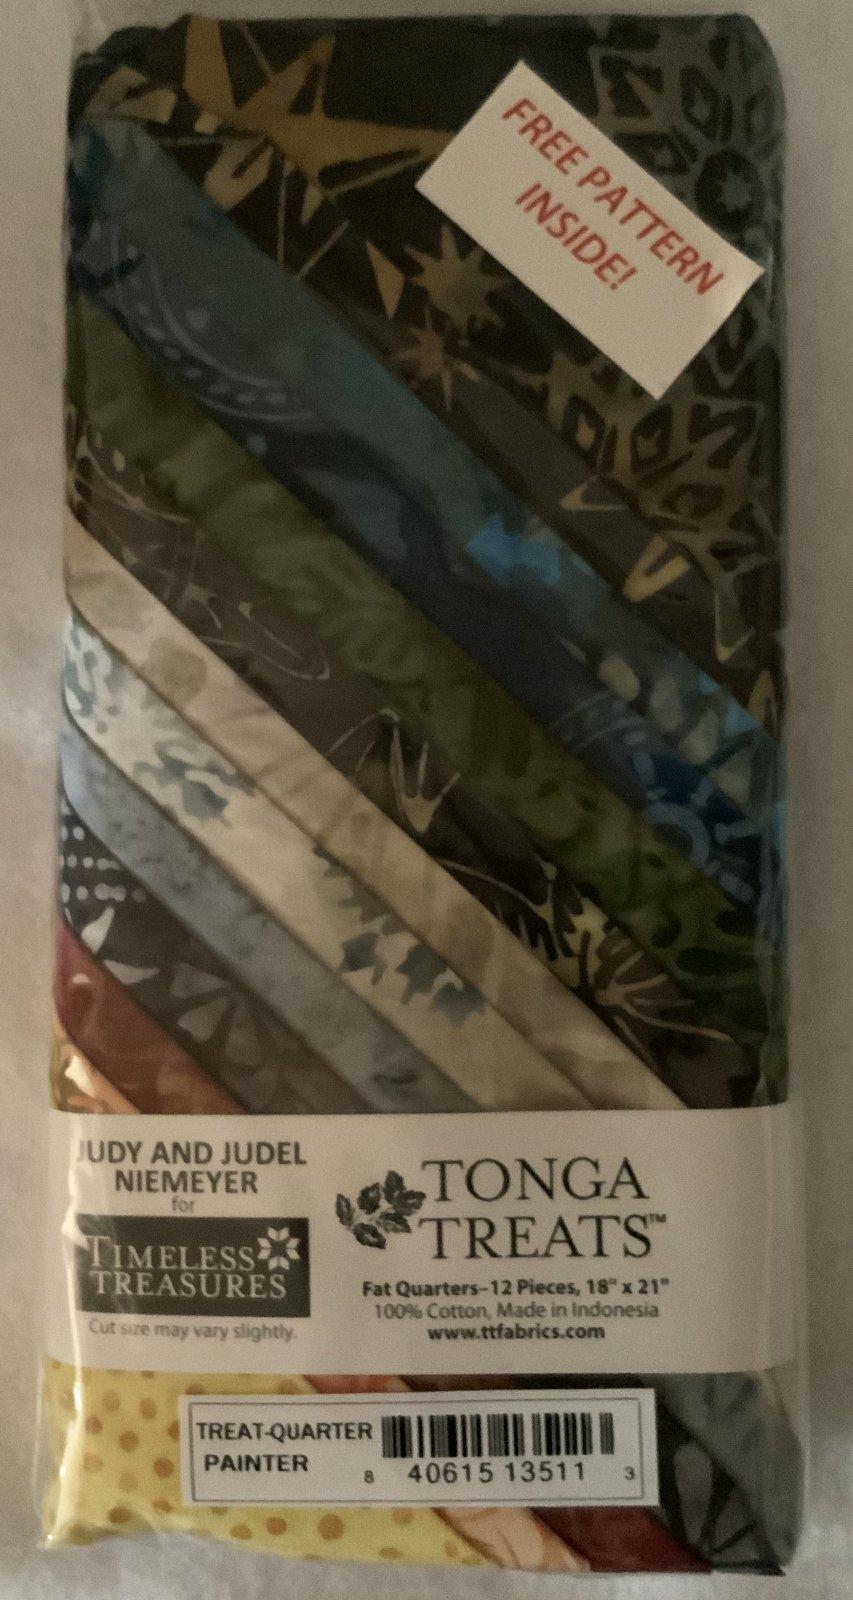 Tonga Treat Fat Quarters Painter (18in x 21in) 12pcs - Timeless Treasures